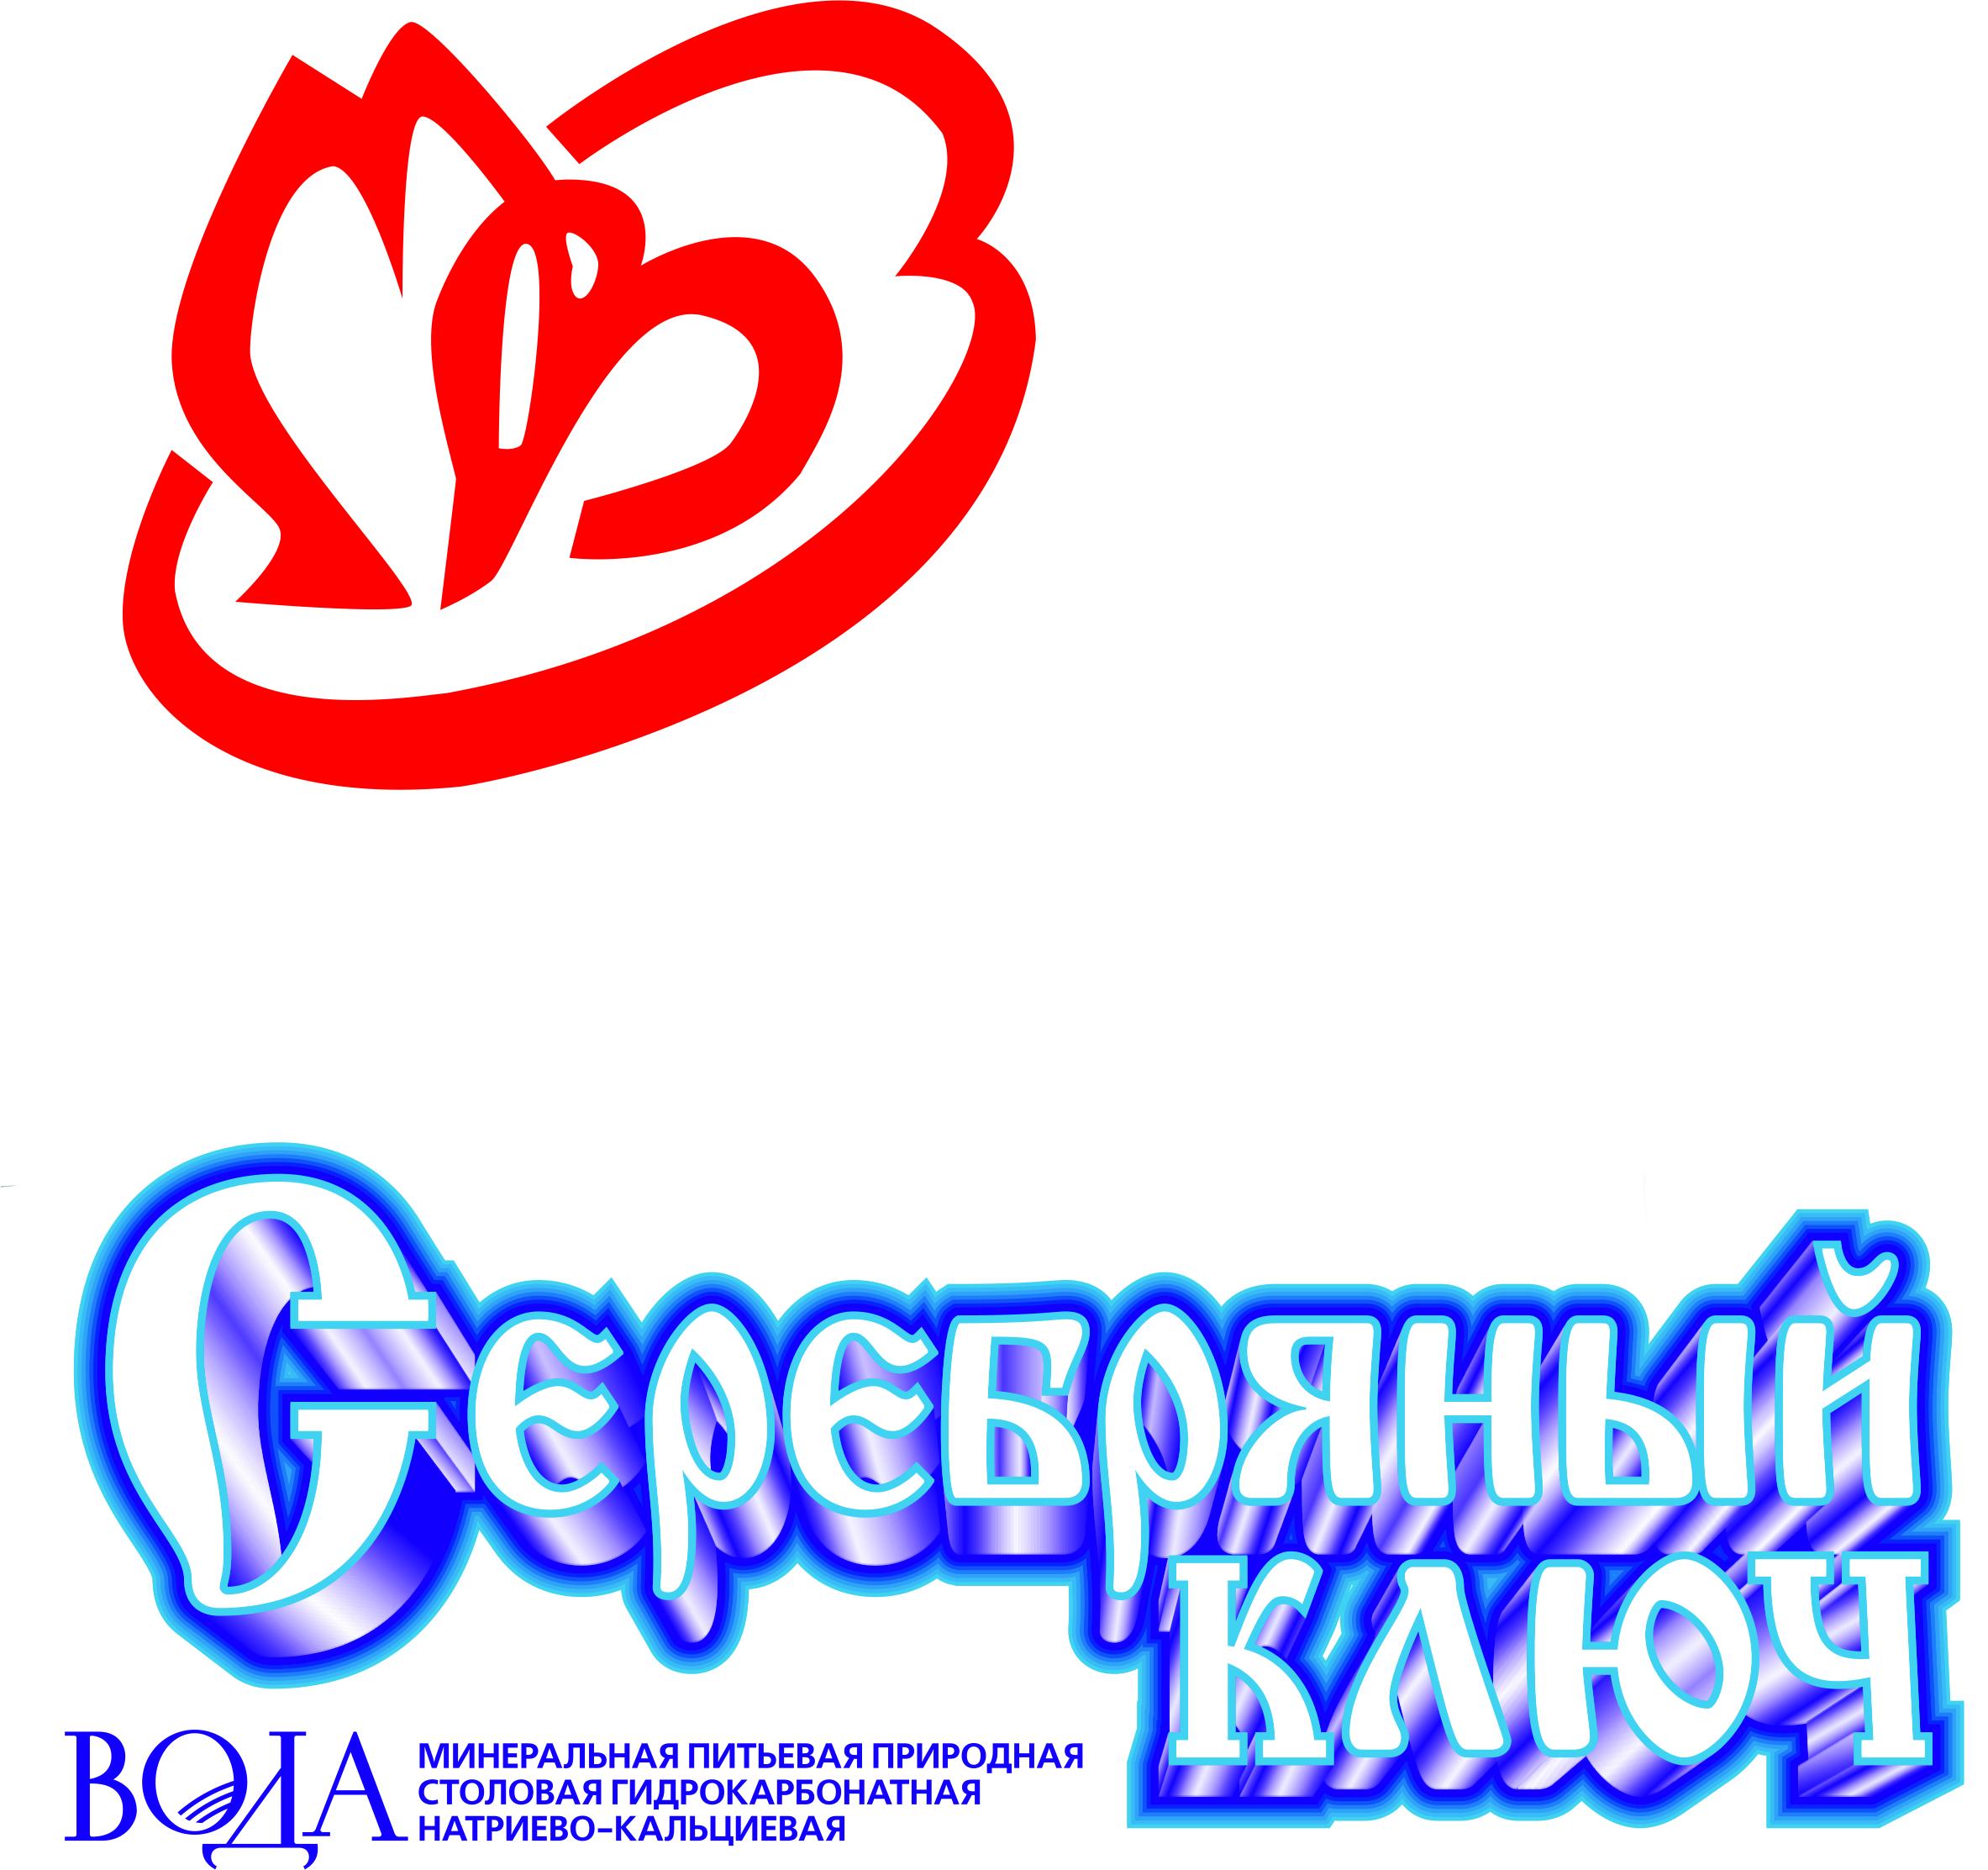 Логотип СЛР - СК